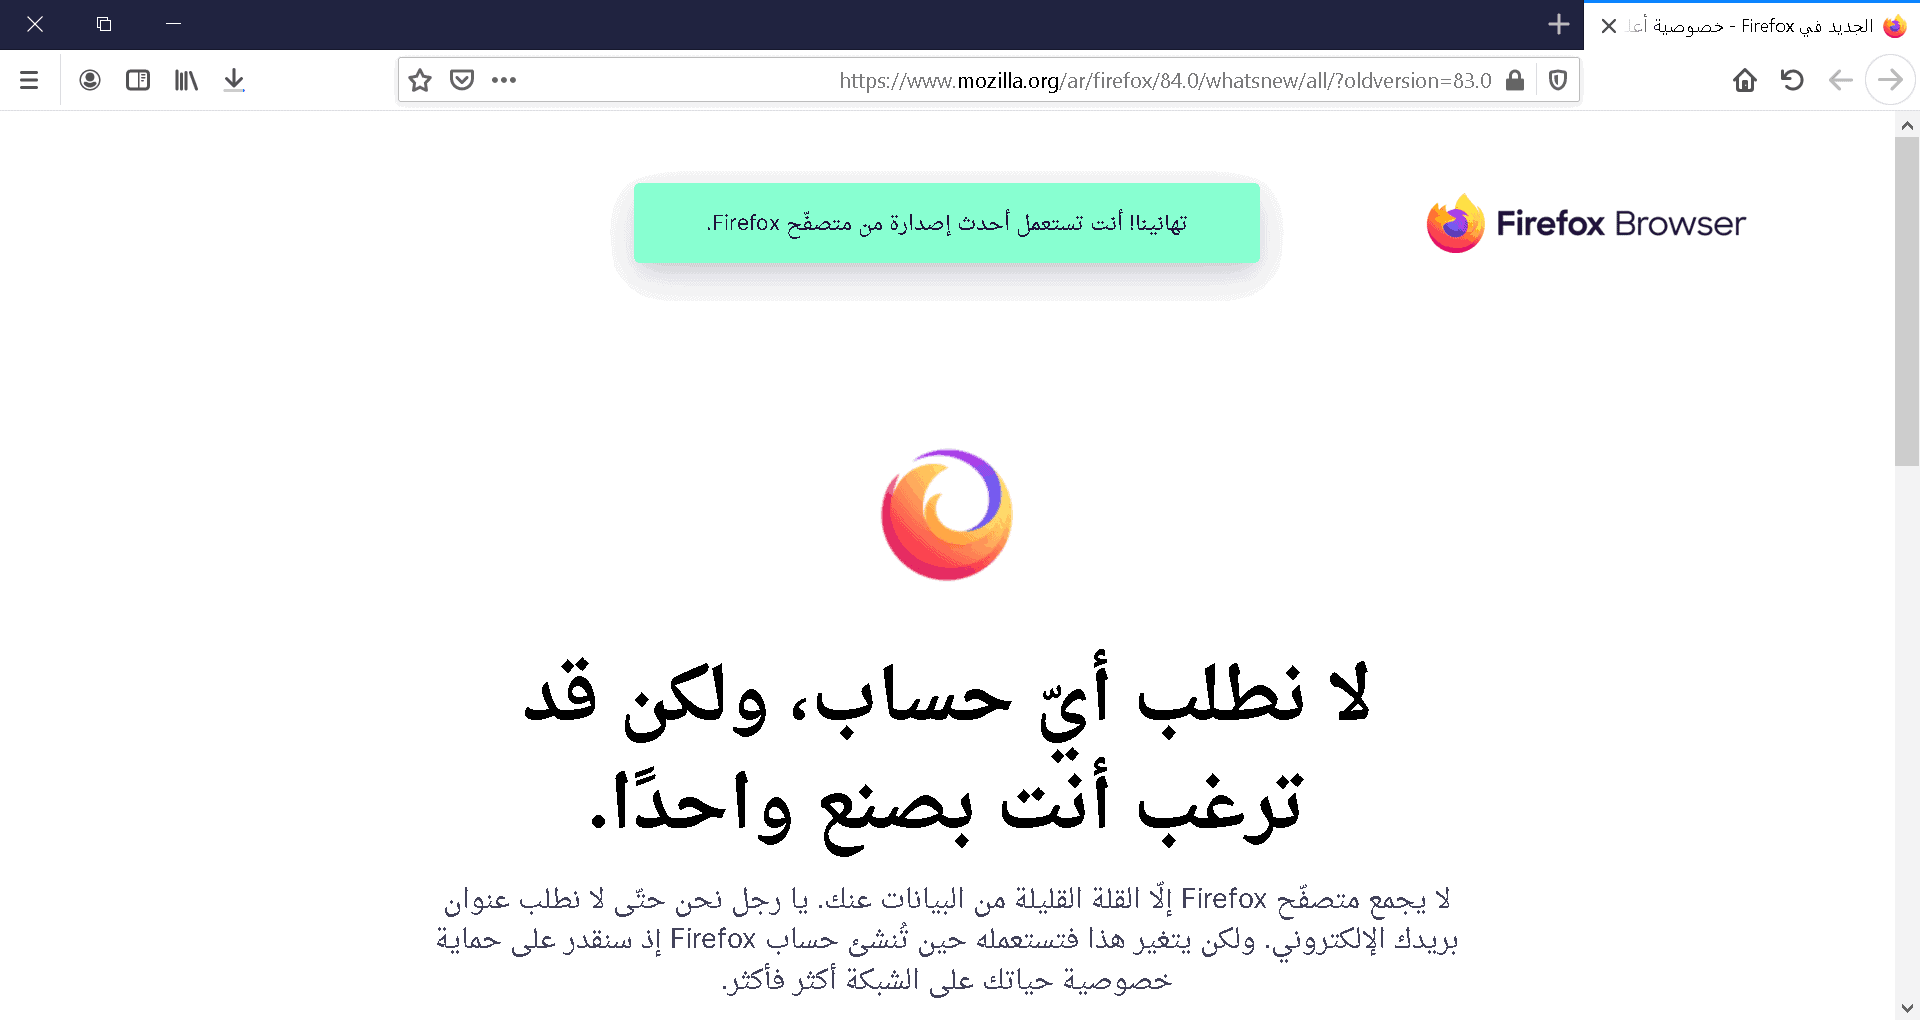 تحميل فايرفوكس للكمبيوتر عربي 32 بت - 64 بت Download Firefox Browser